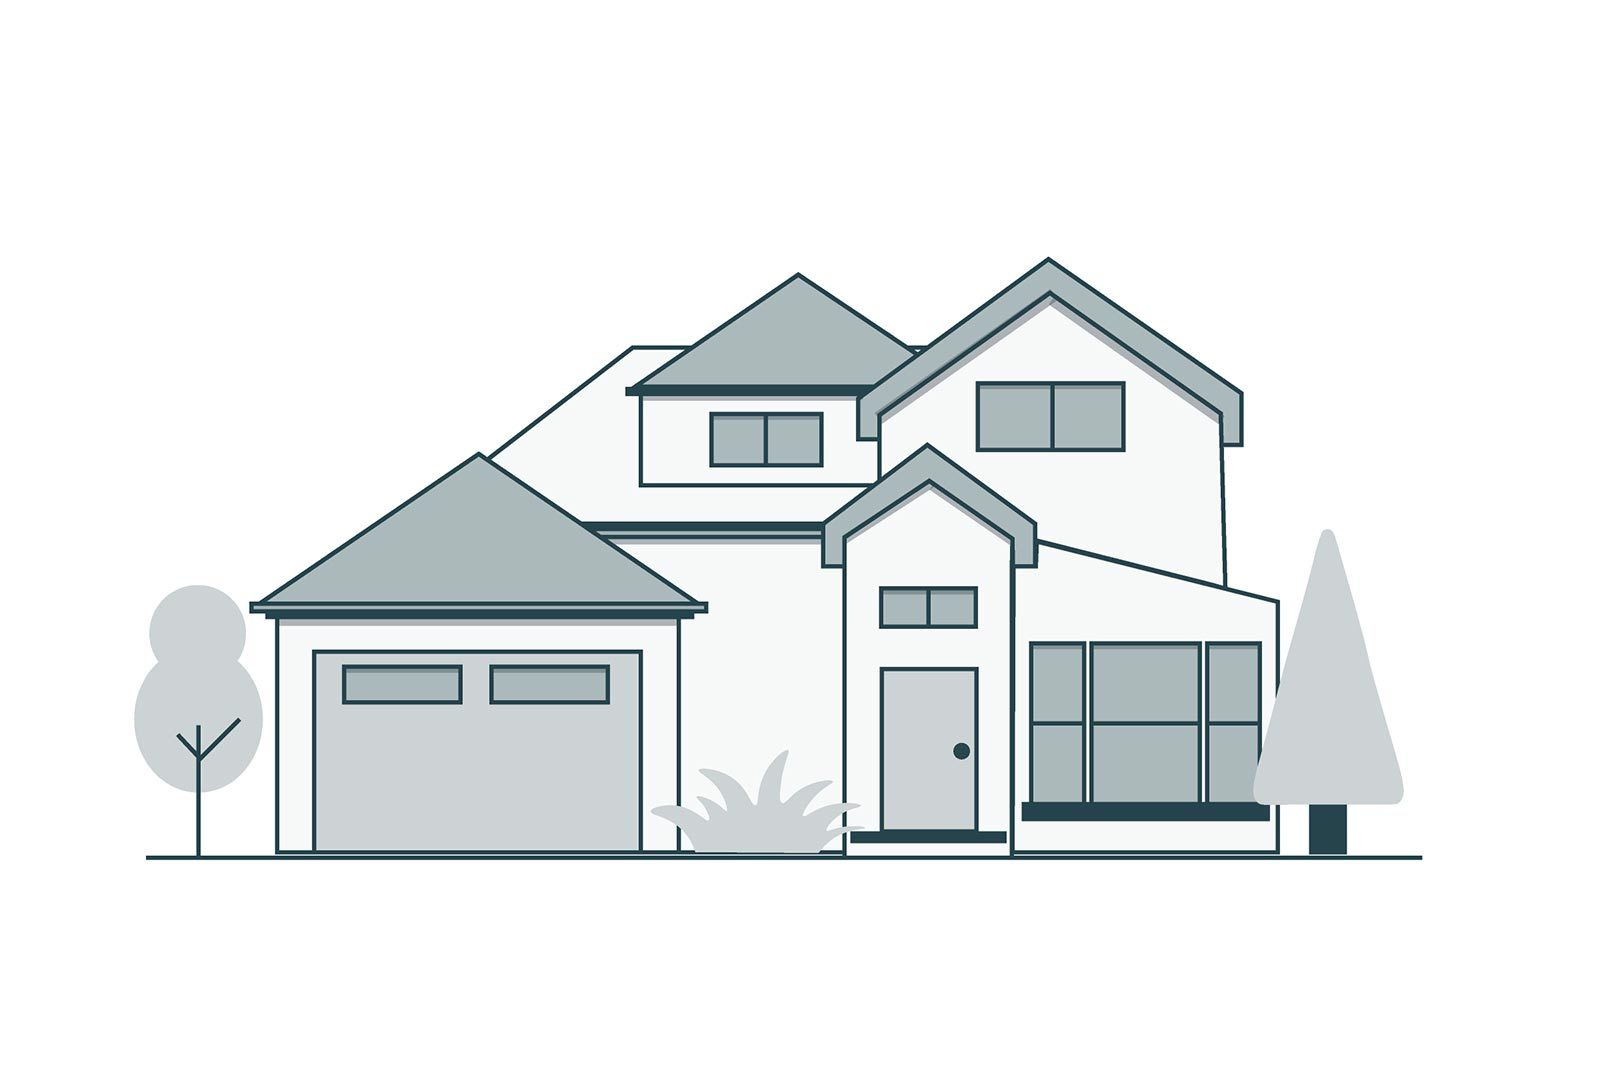 823 S Filbert St Stockton, CA 95205